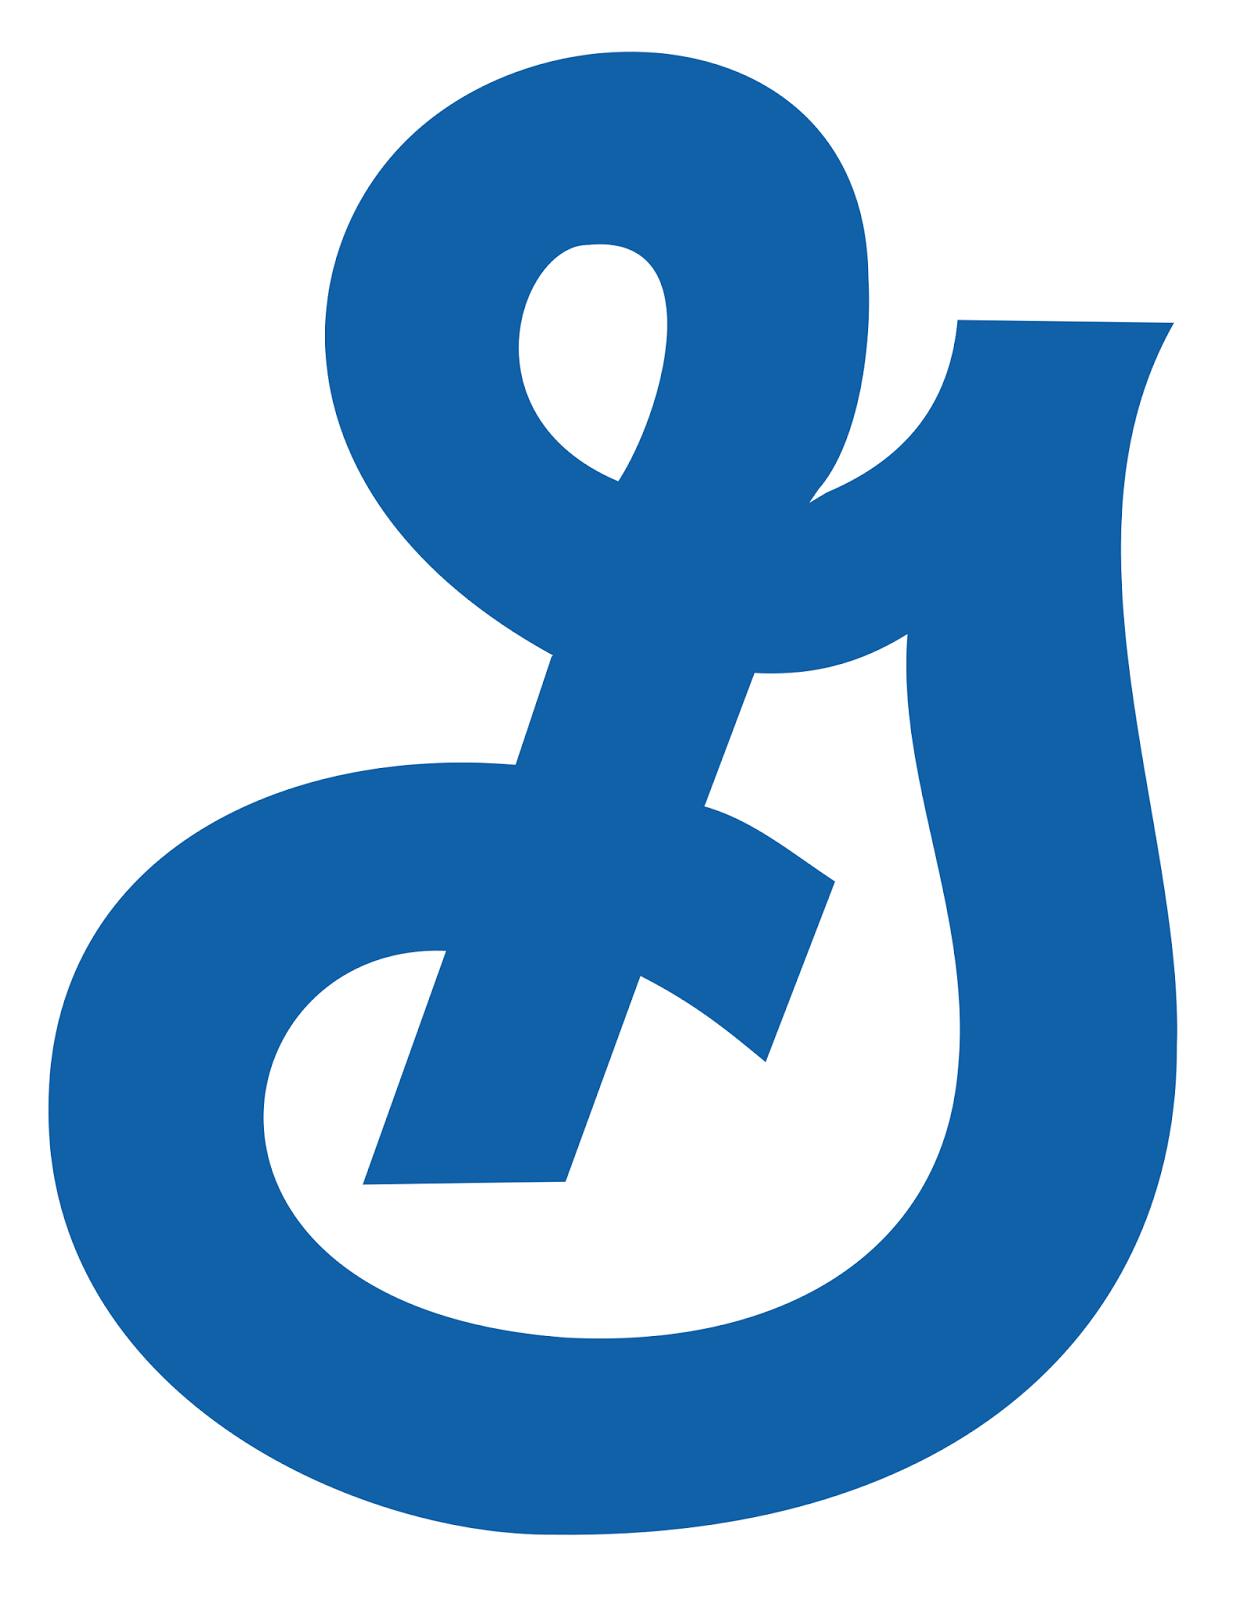 Big G General Mills logo